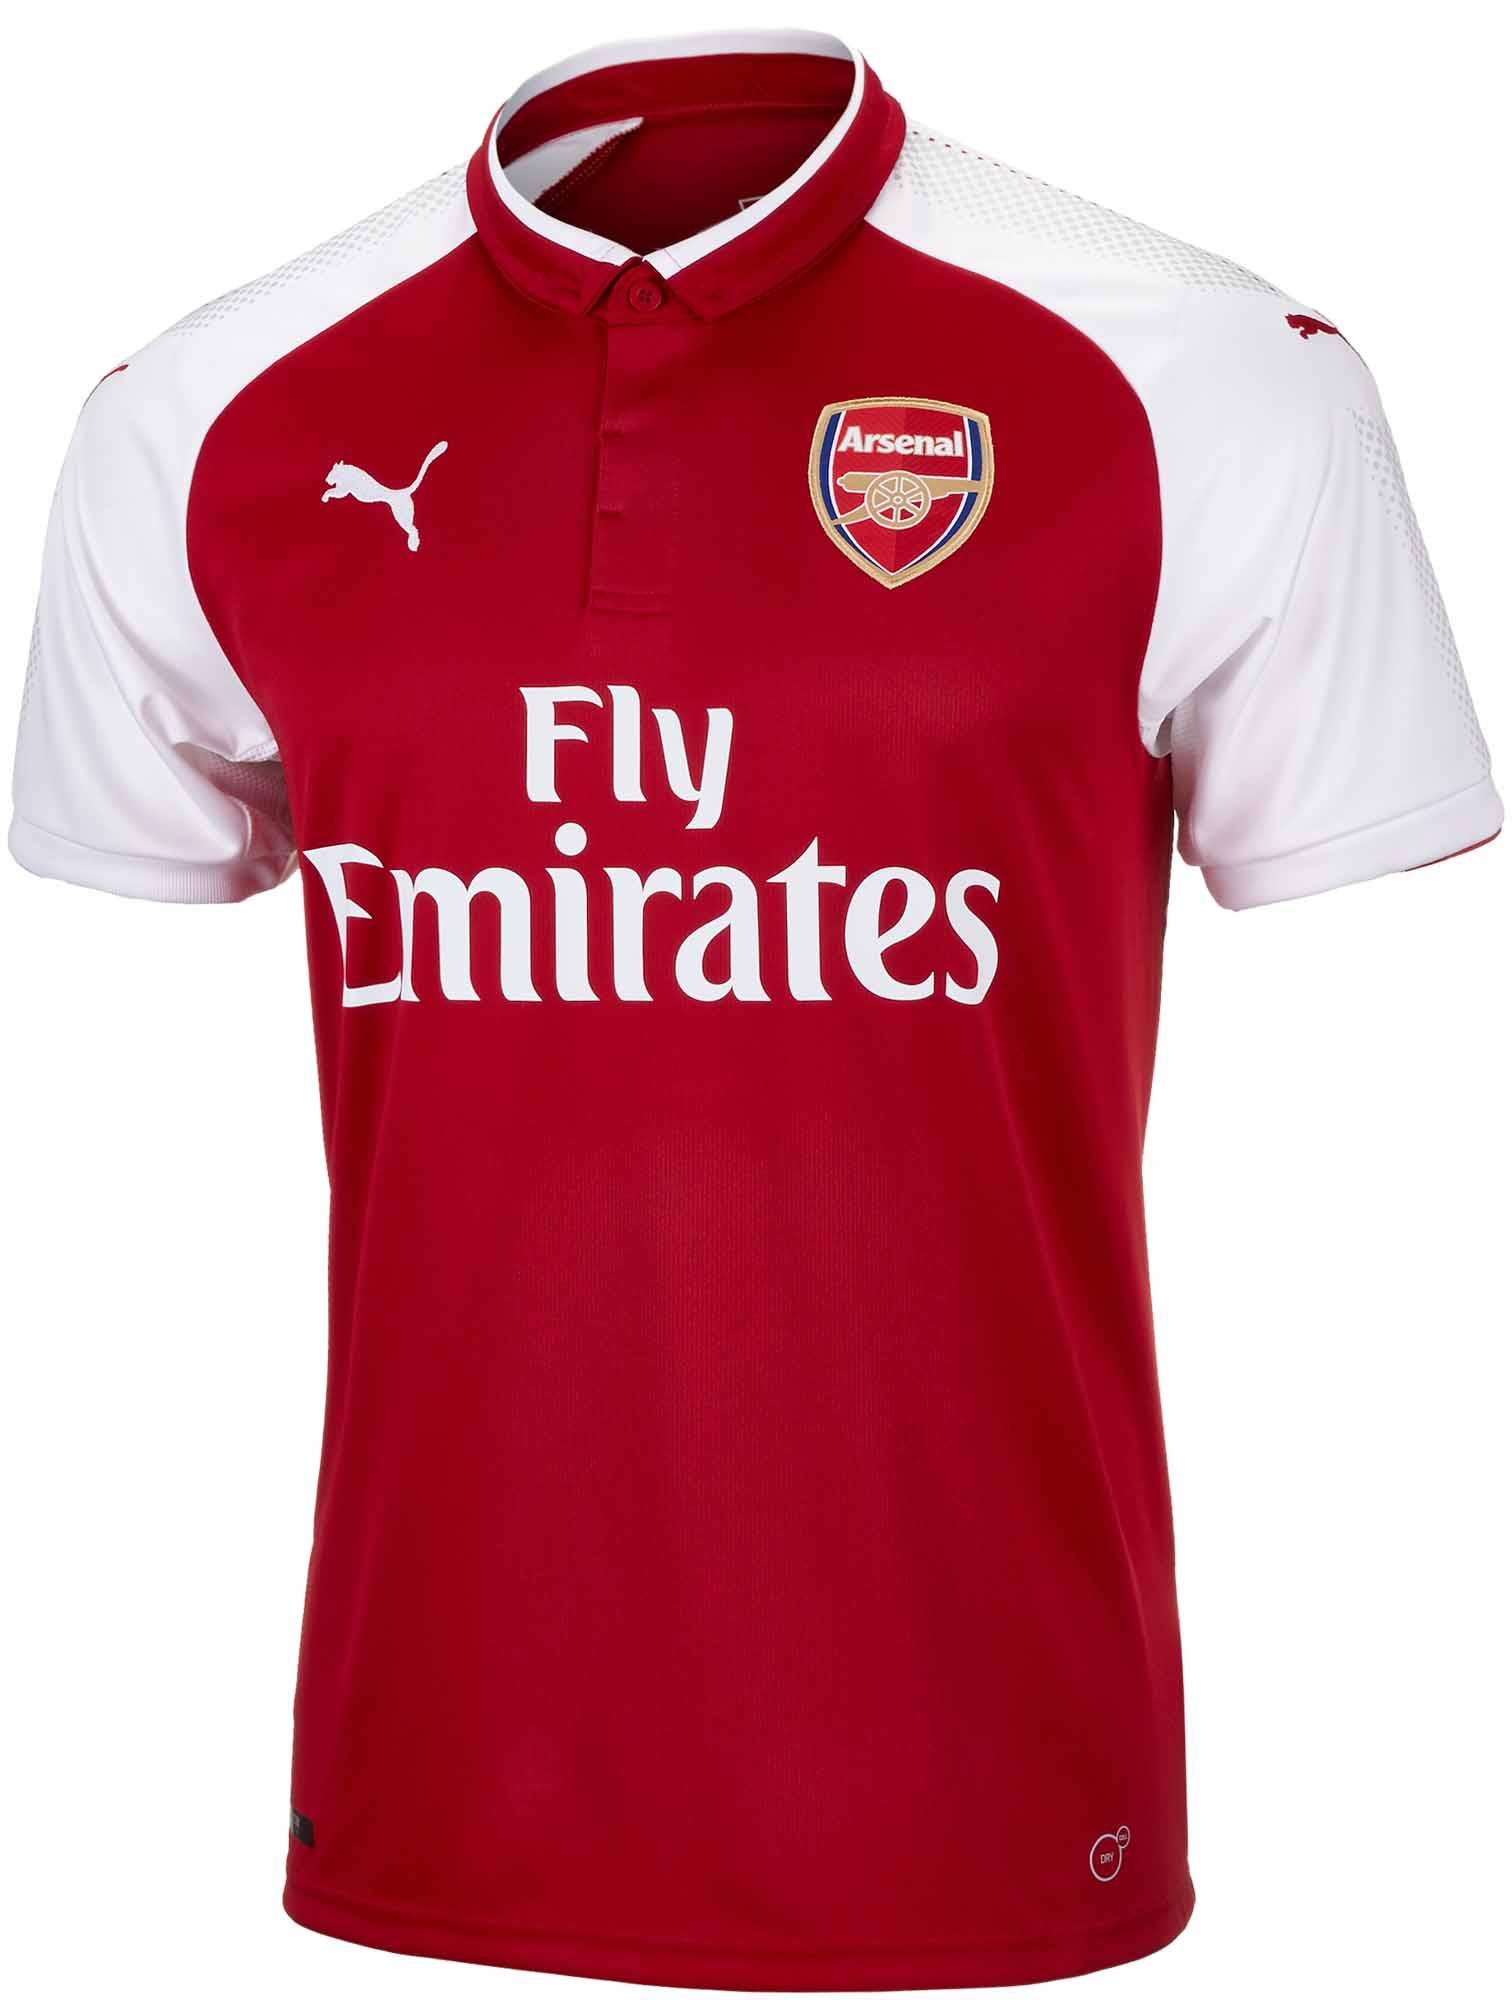 Puma Arsenal Kids Home Jersey - 2017/18 Soccer Jerseys